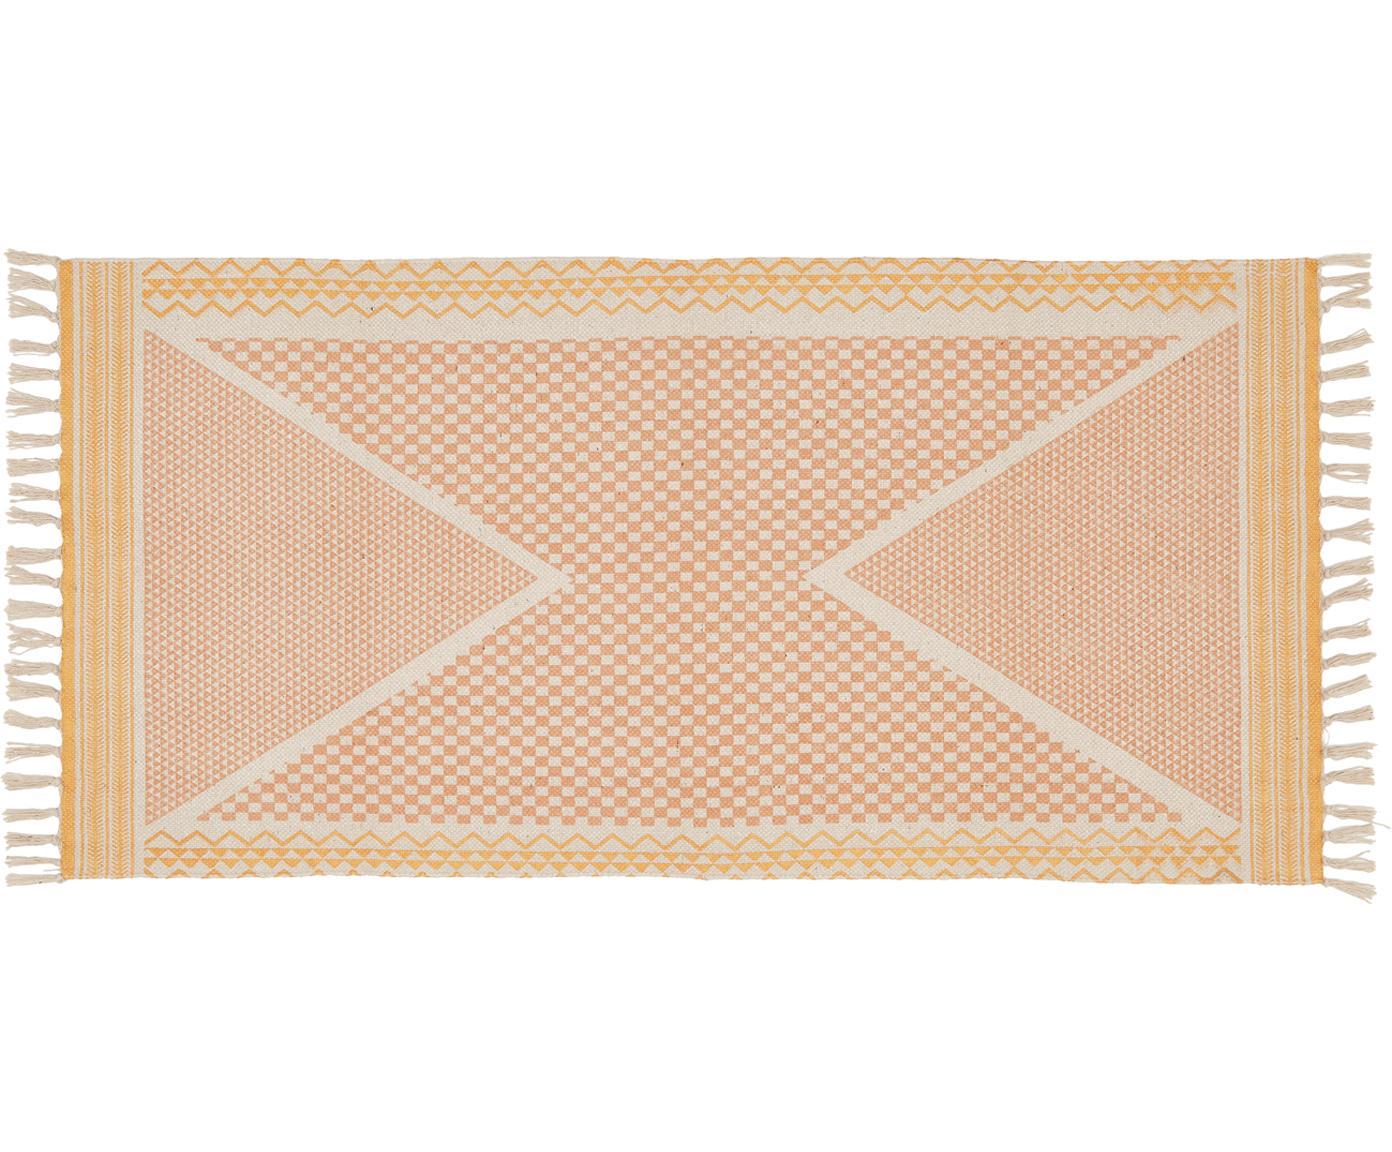 Alfombra de algodón Kjell, Blanco, rosa, dorado, An 75 x L 145 cm (Tamaño XS)